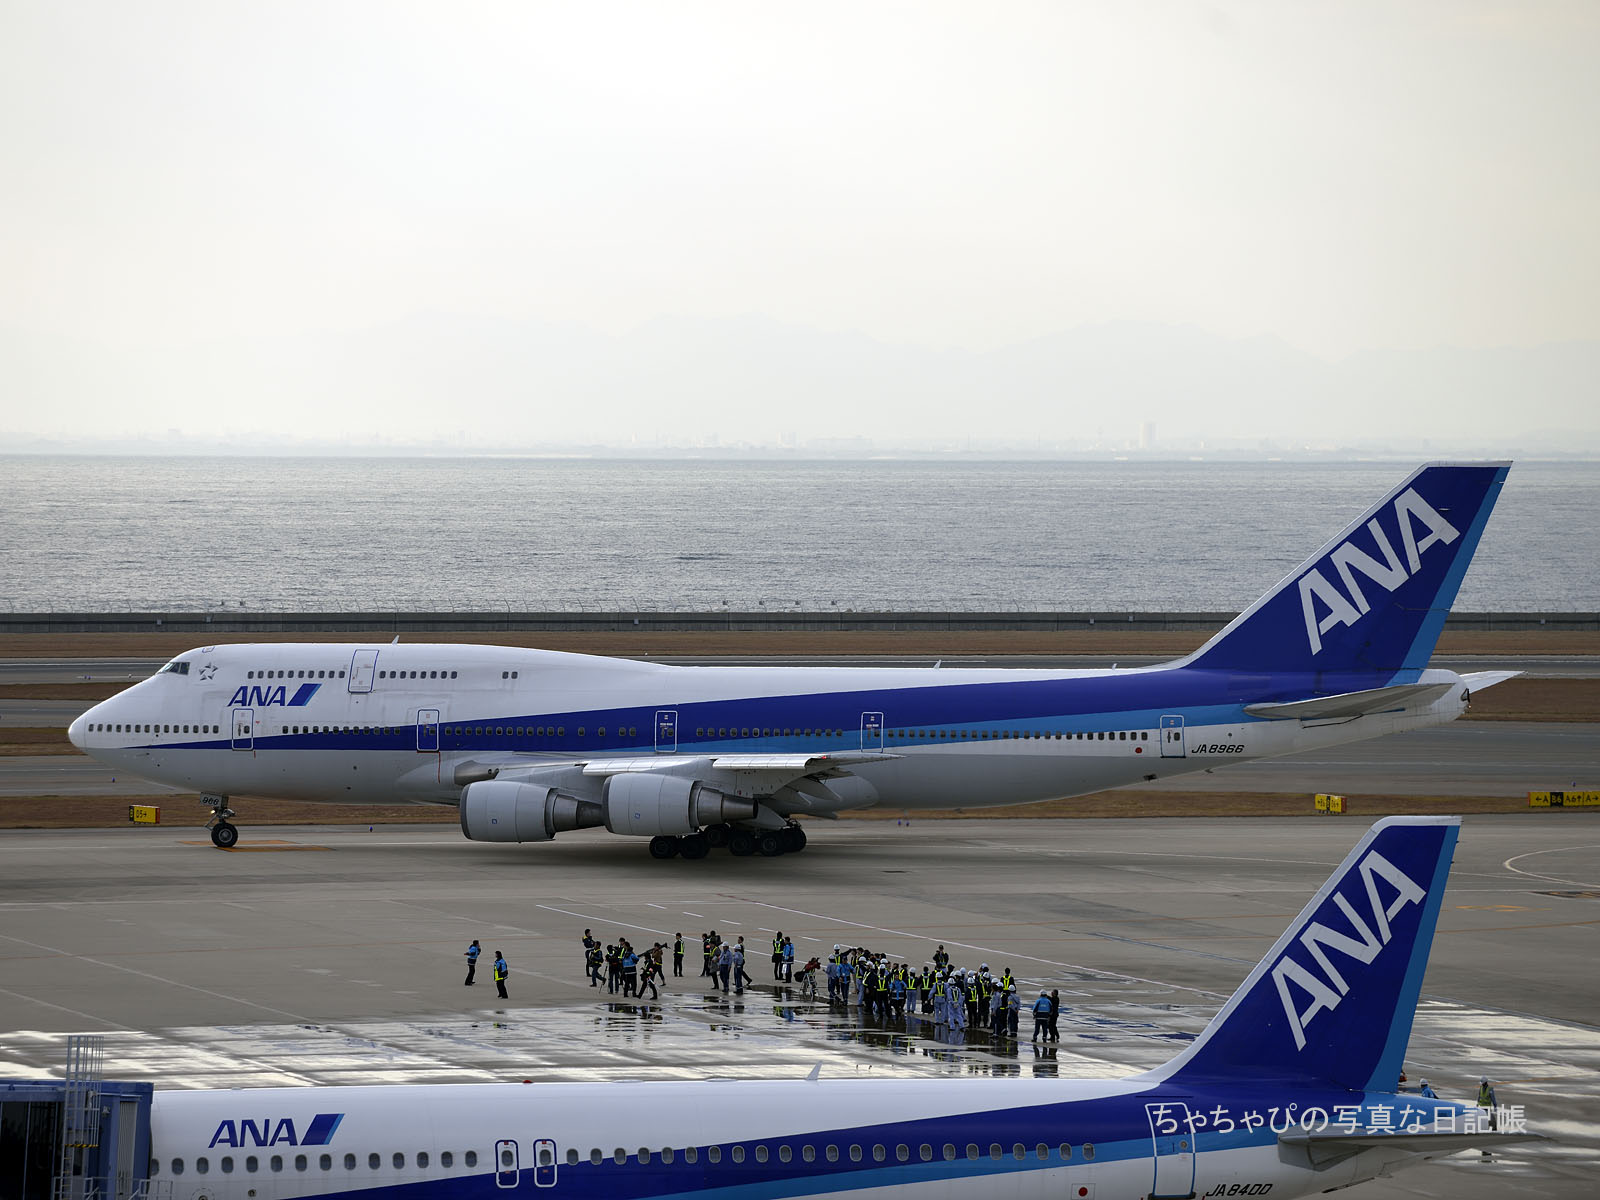 ANA B747-400D 里帰りフライト